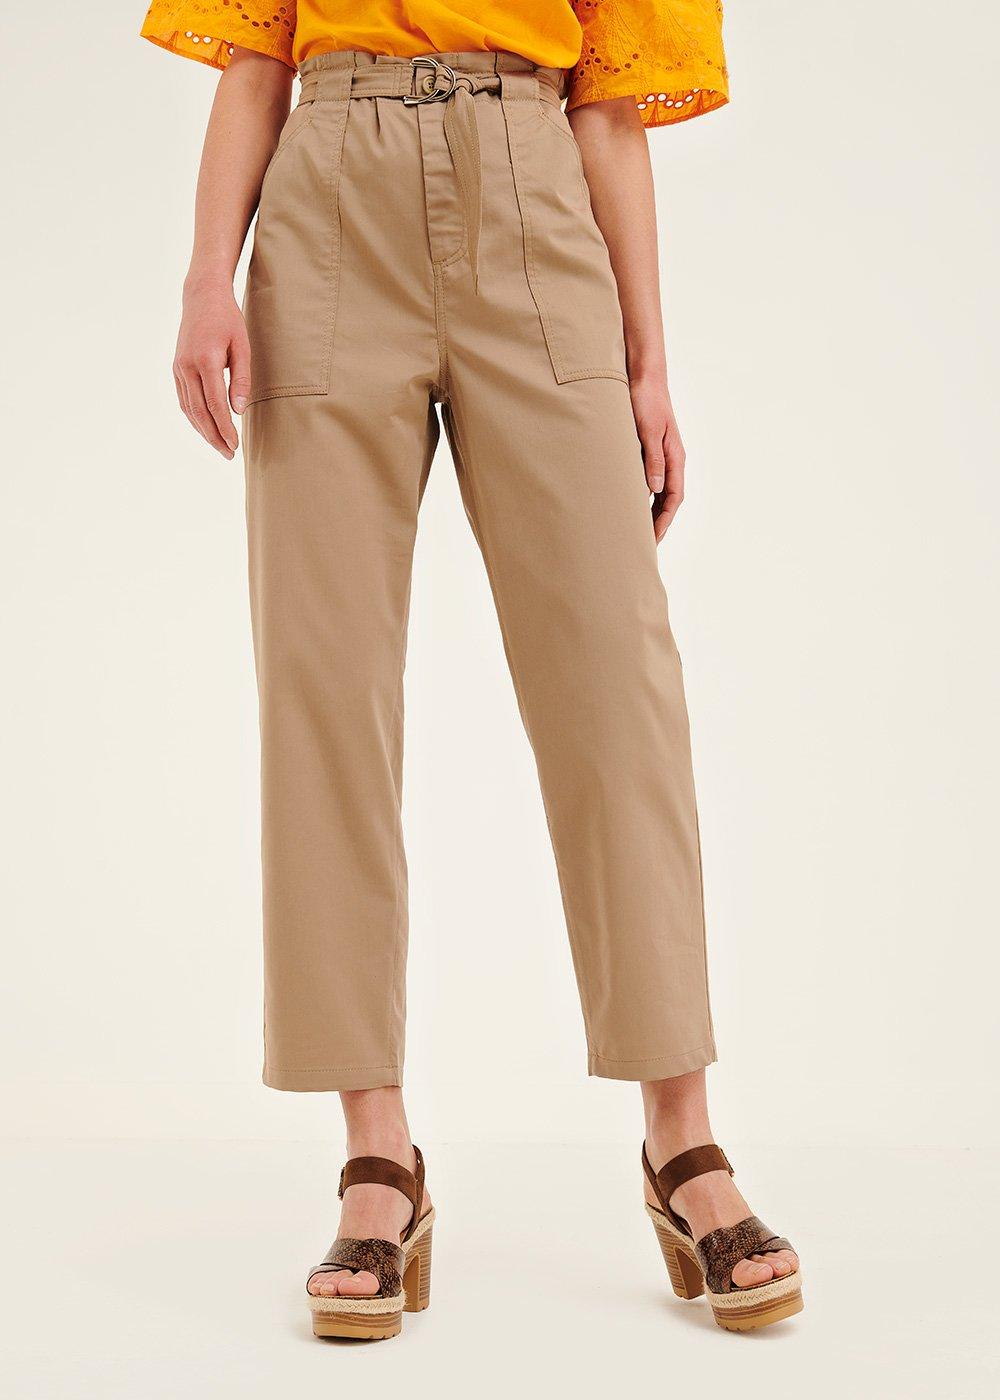 Pantalone Lara con tasconi e fibbia - Desert - Donna